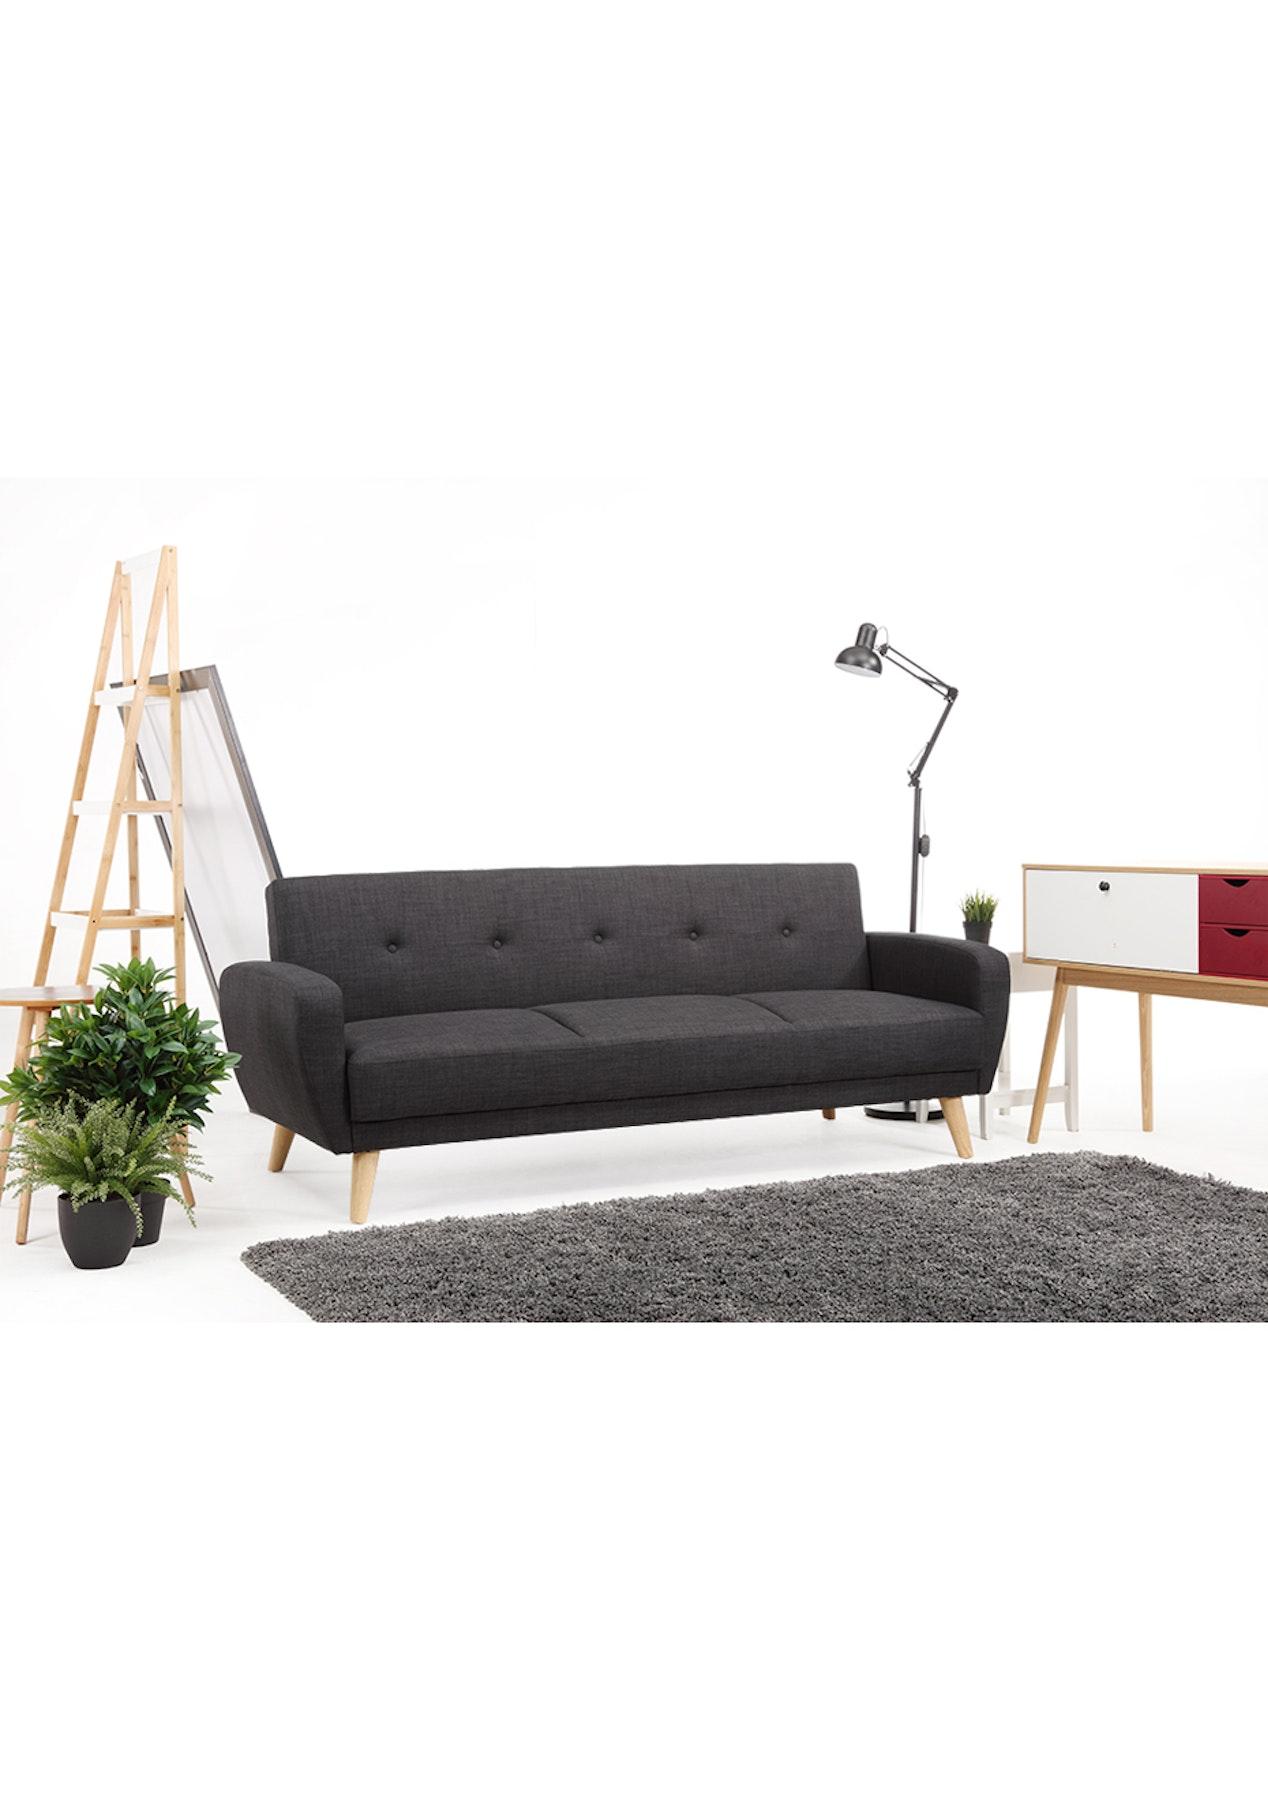 Oslo Sofa Bed Wooden Legs